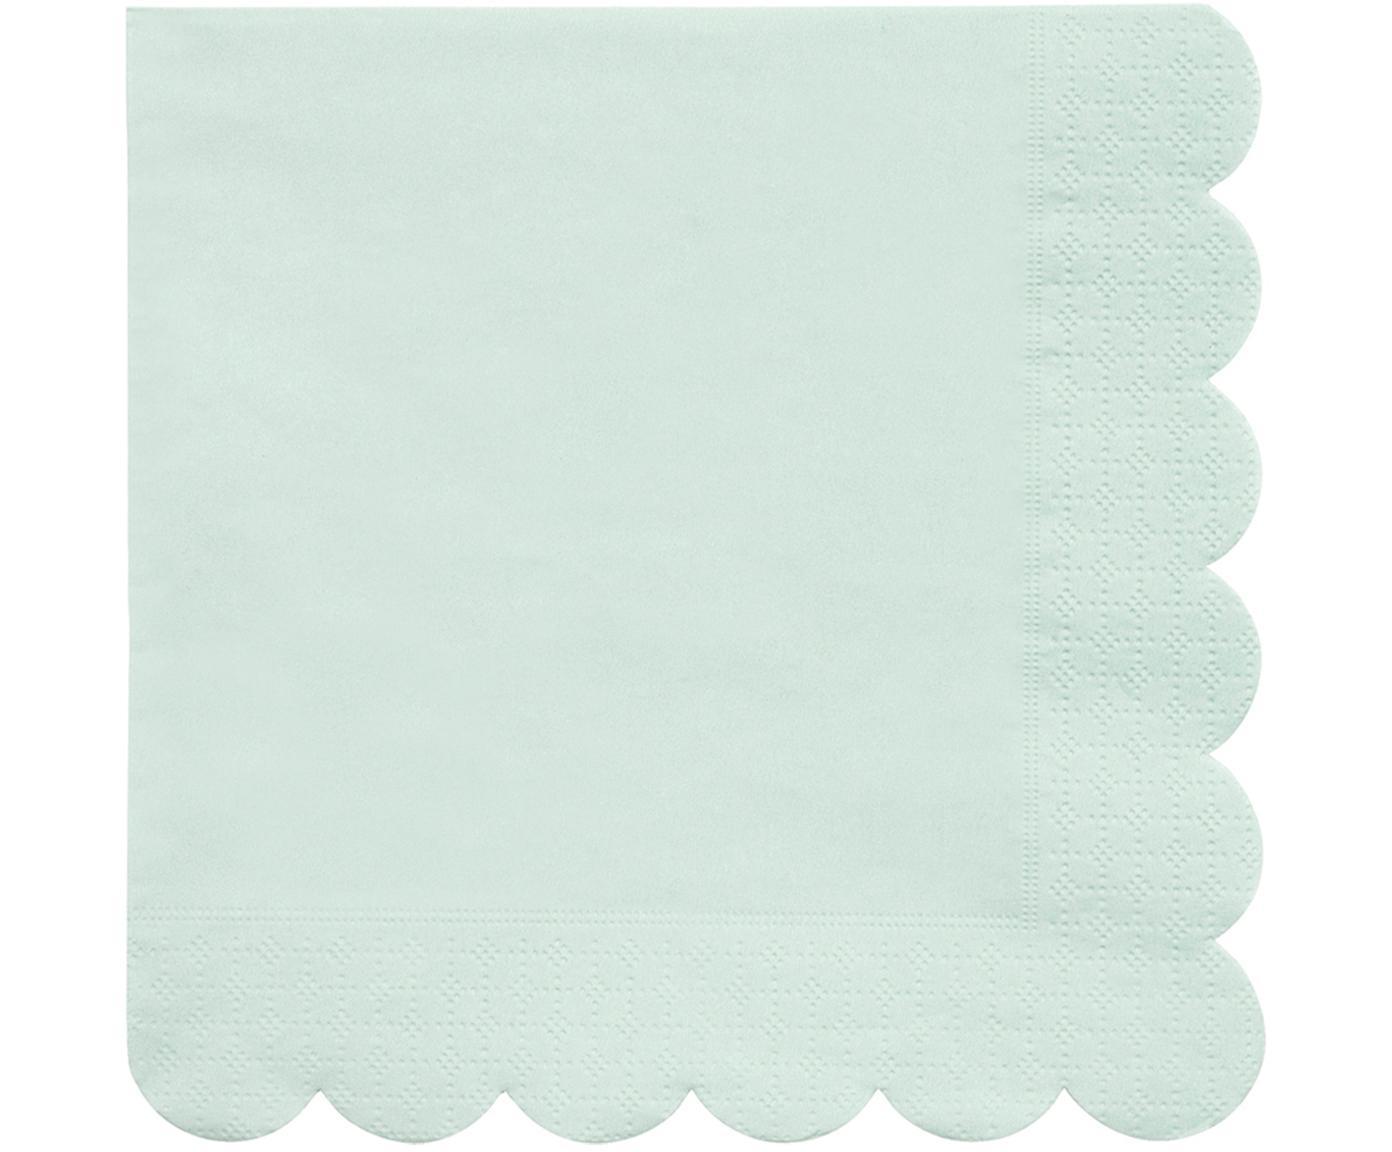 Papier-Servietten Simply Eco, 20 Stück, Papier, Mintgrün, 33 x 33 cm